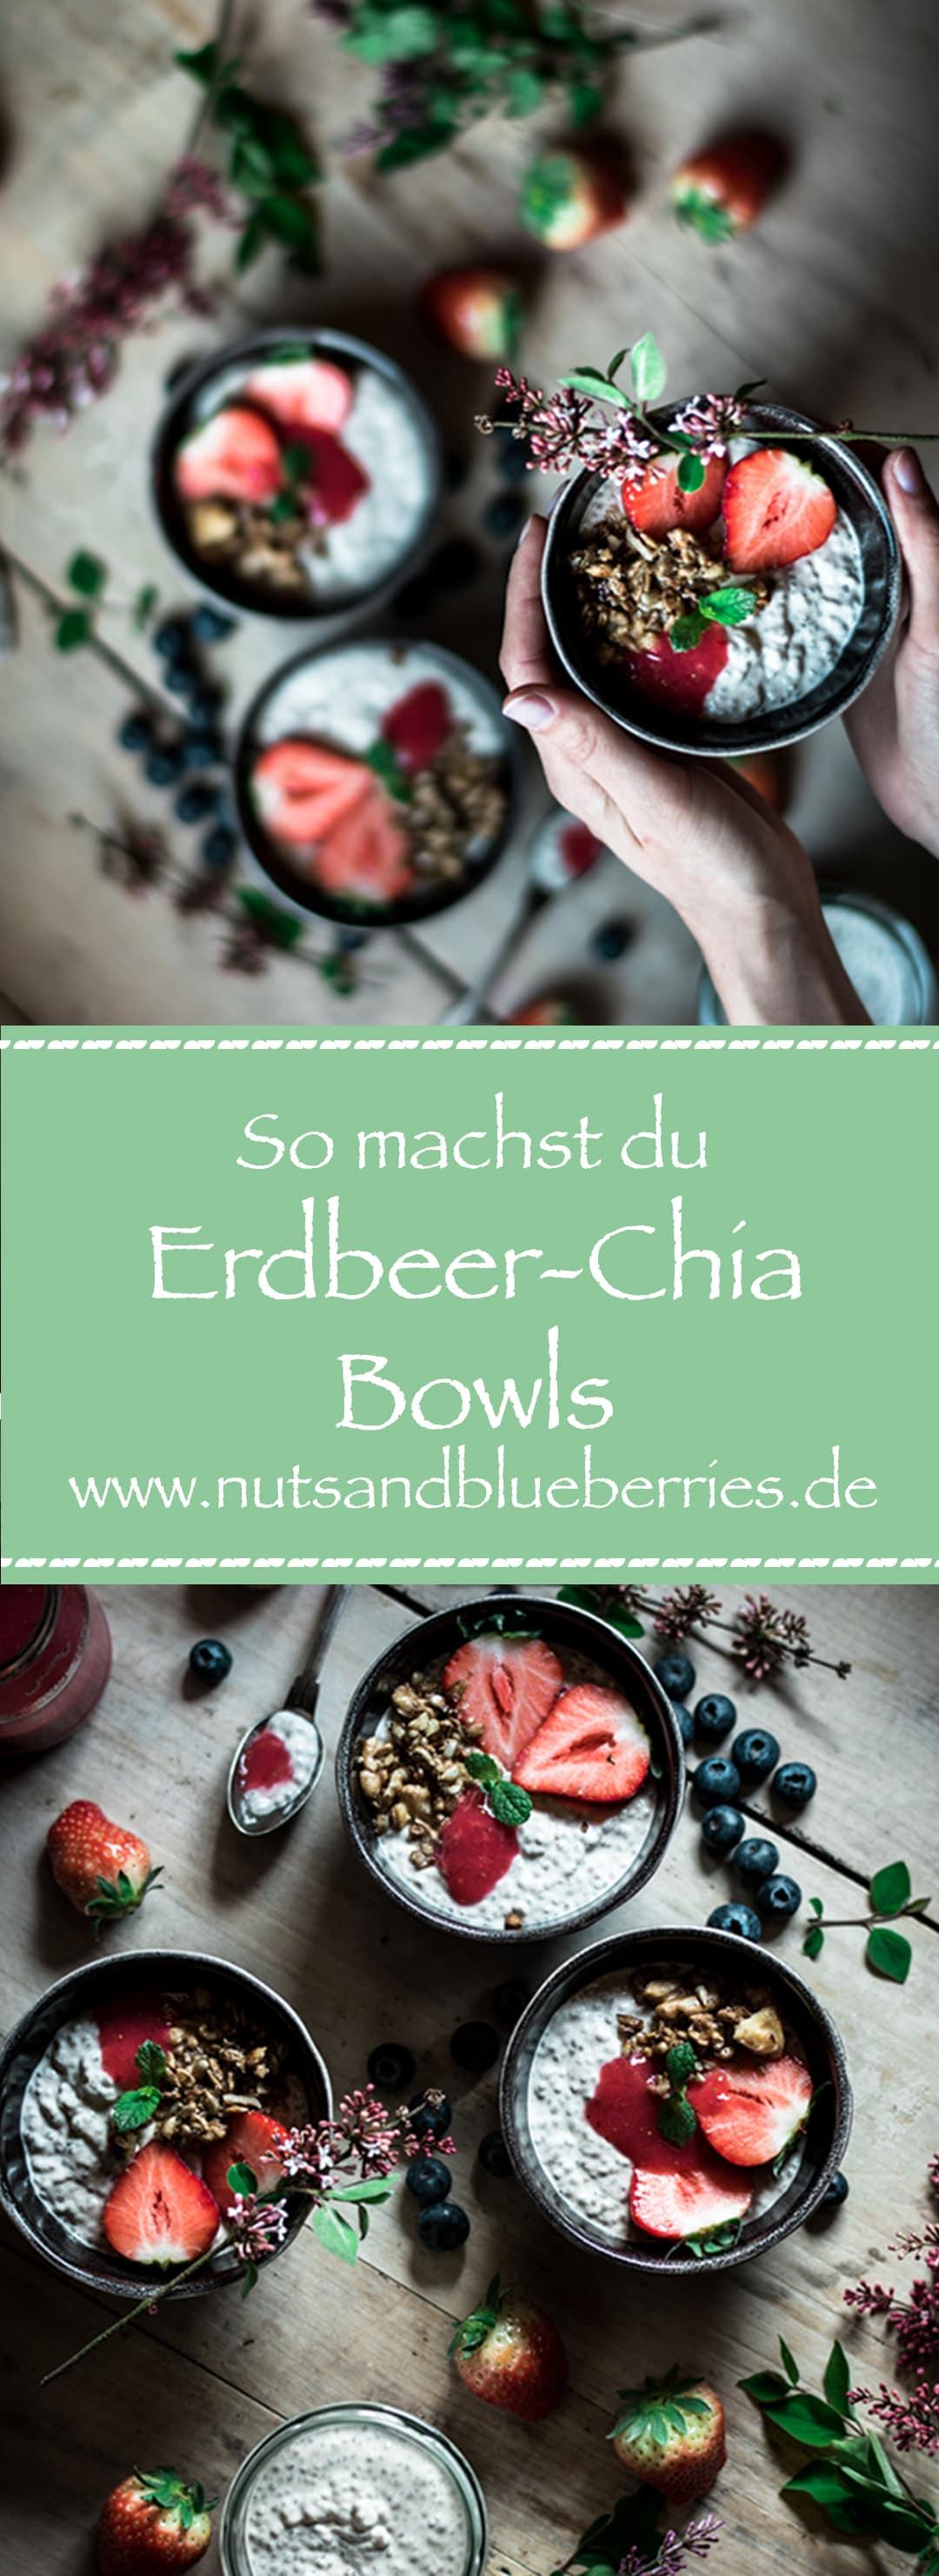 erdbeer-chia-bowl